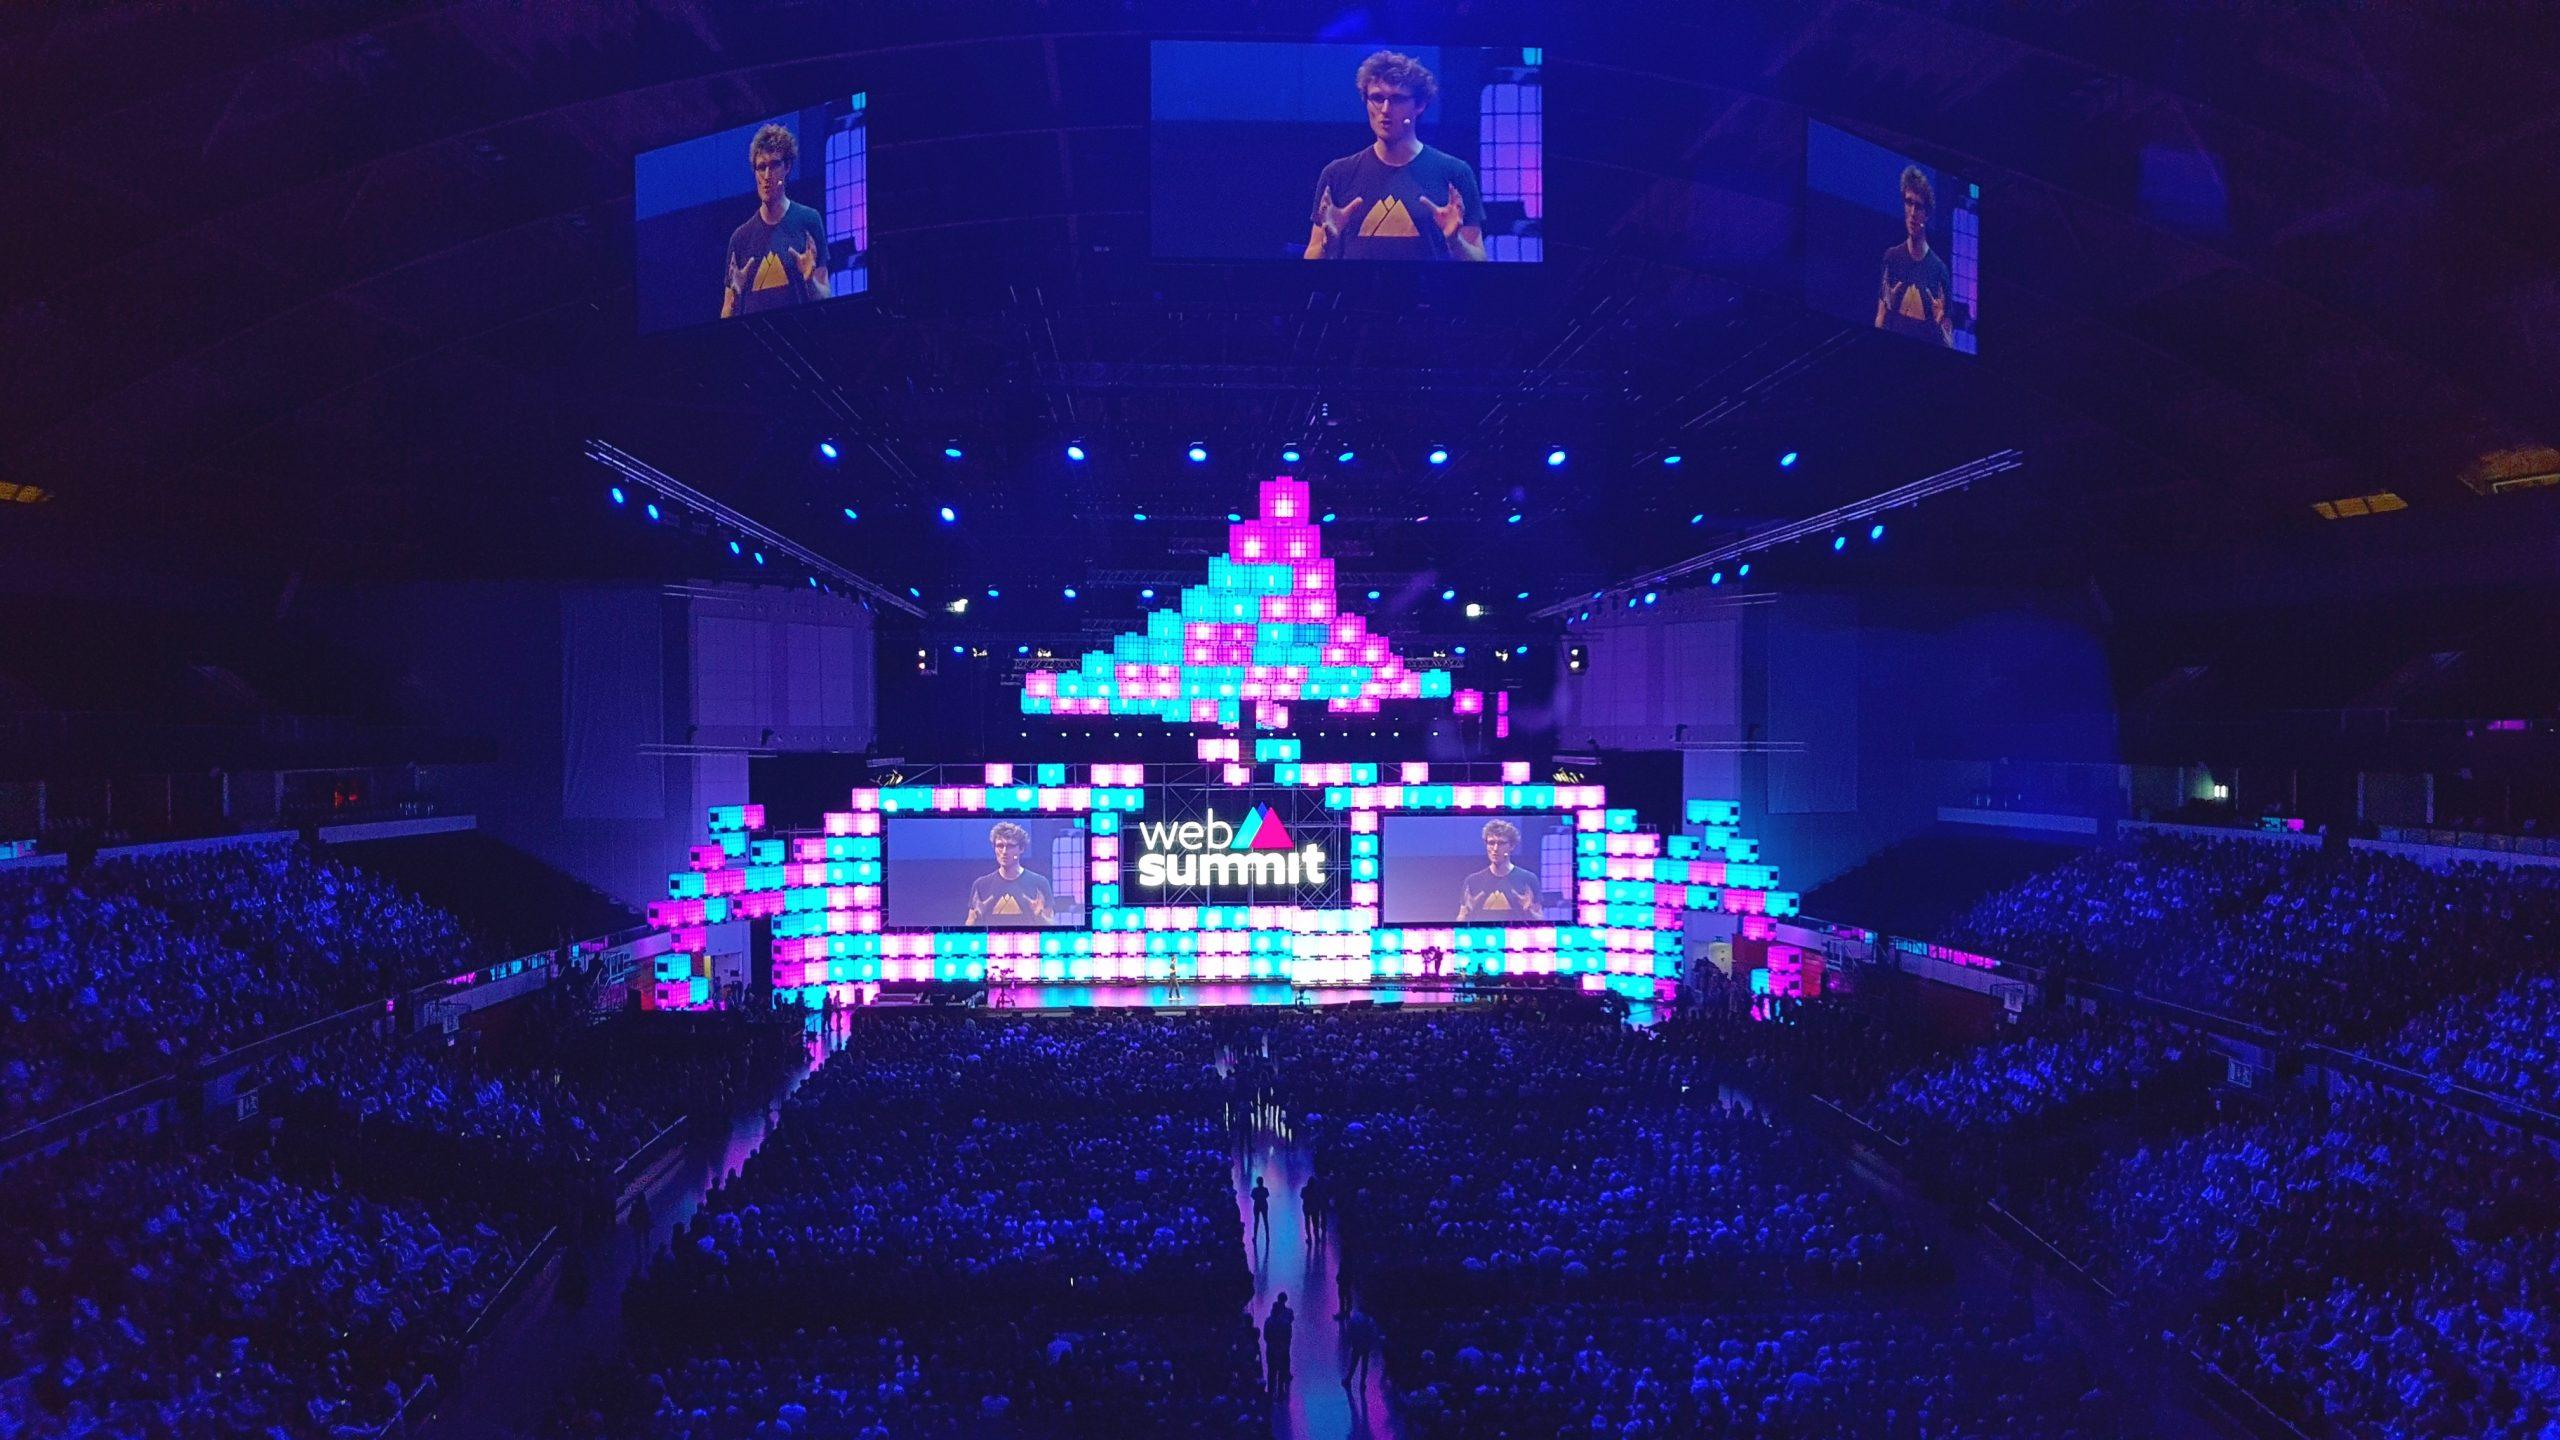 Quer ir à Web Summit 2018? Comece já a planear!